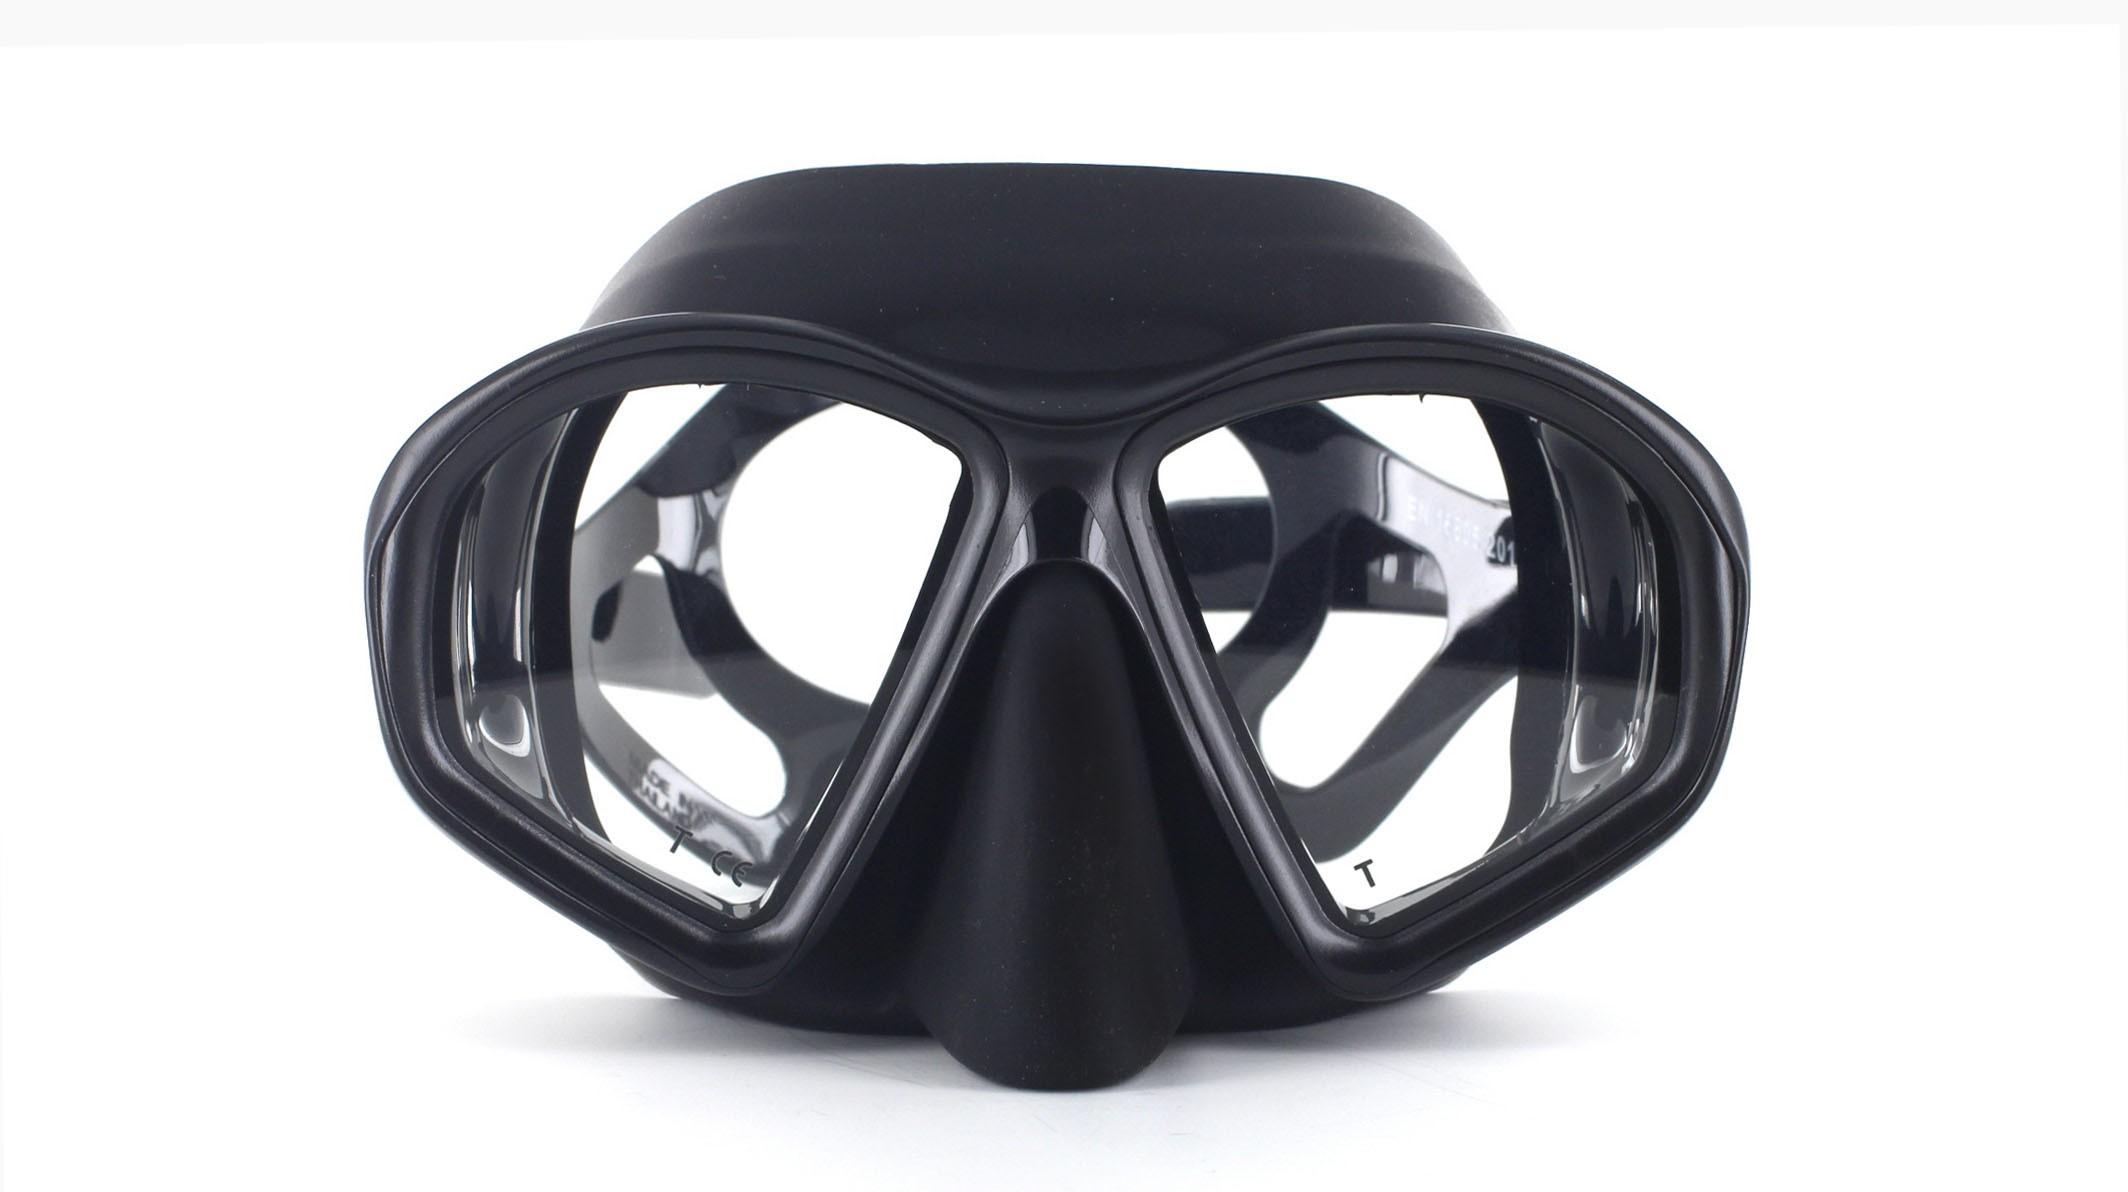 Mares Sealhouette SF - Apnoe - schwarz